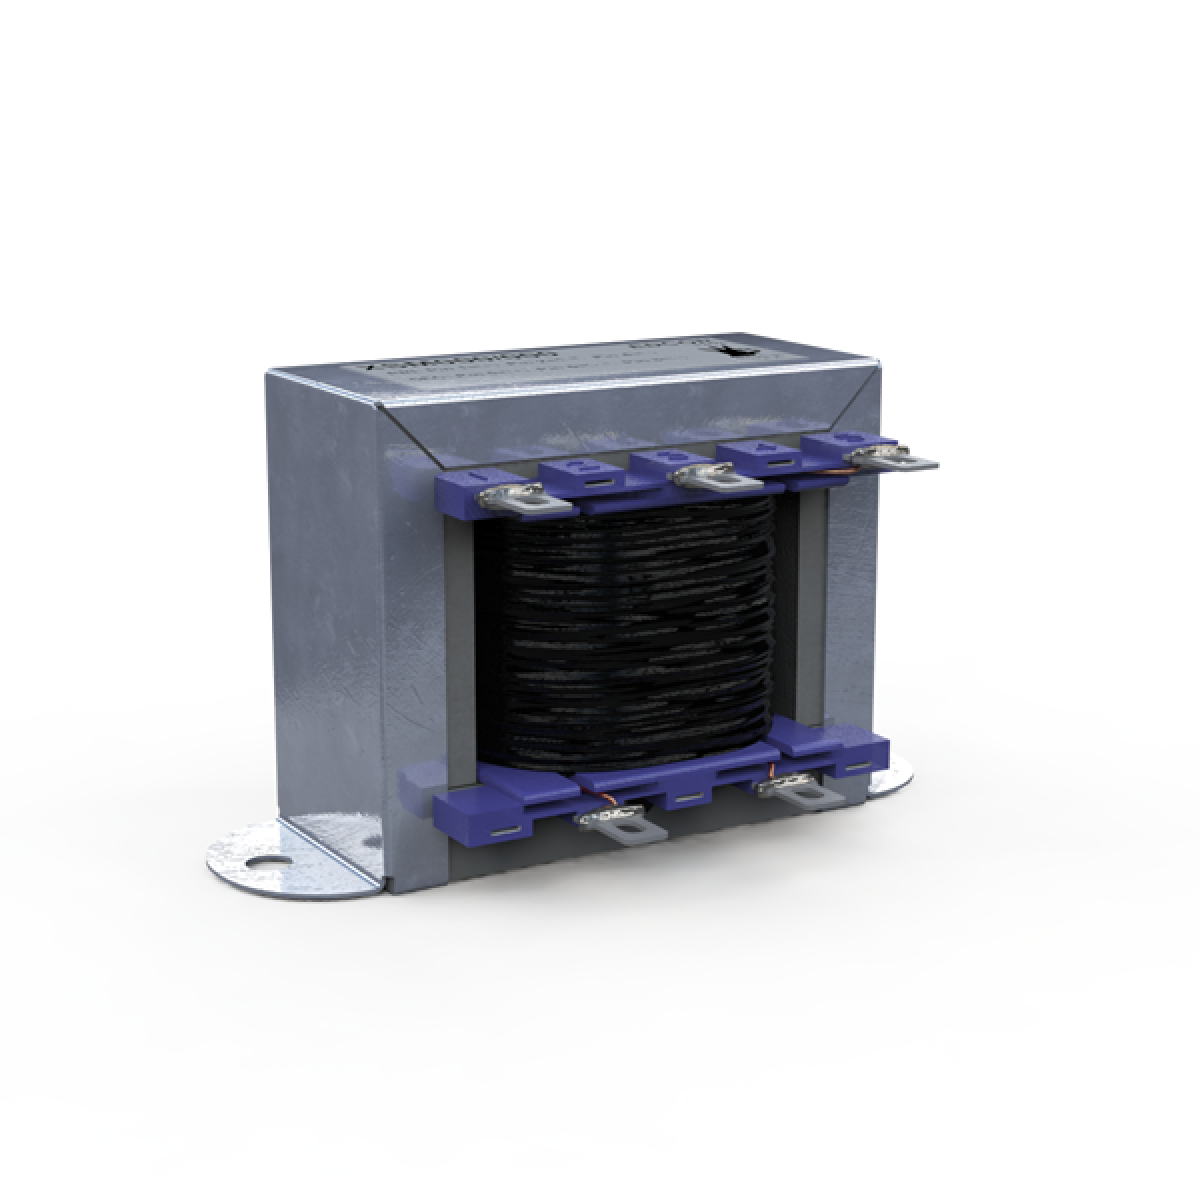 Edcor GXSE5-600-5k